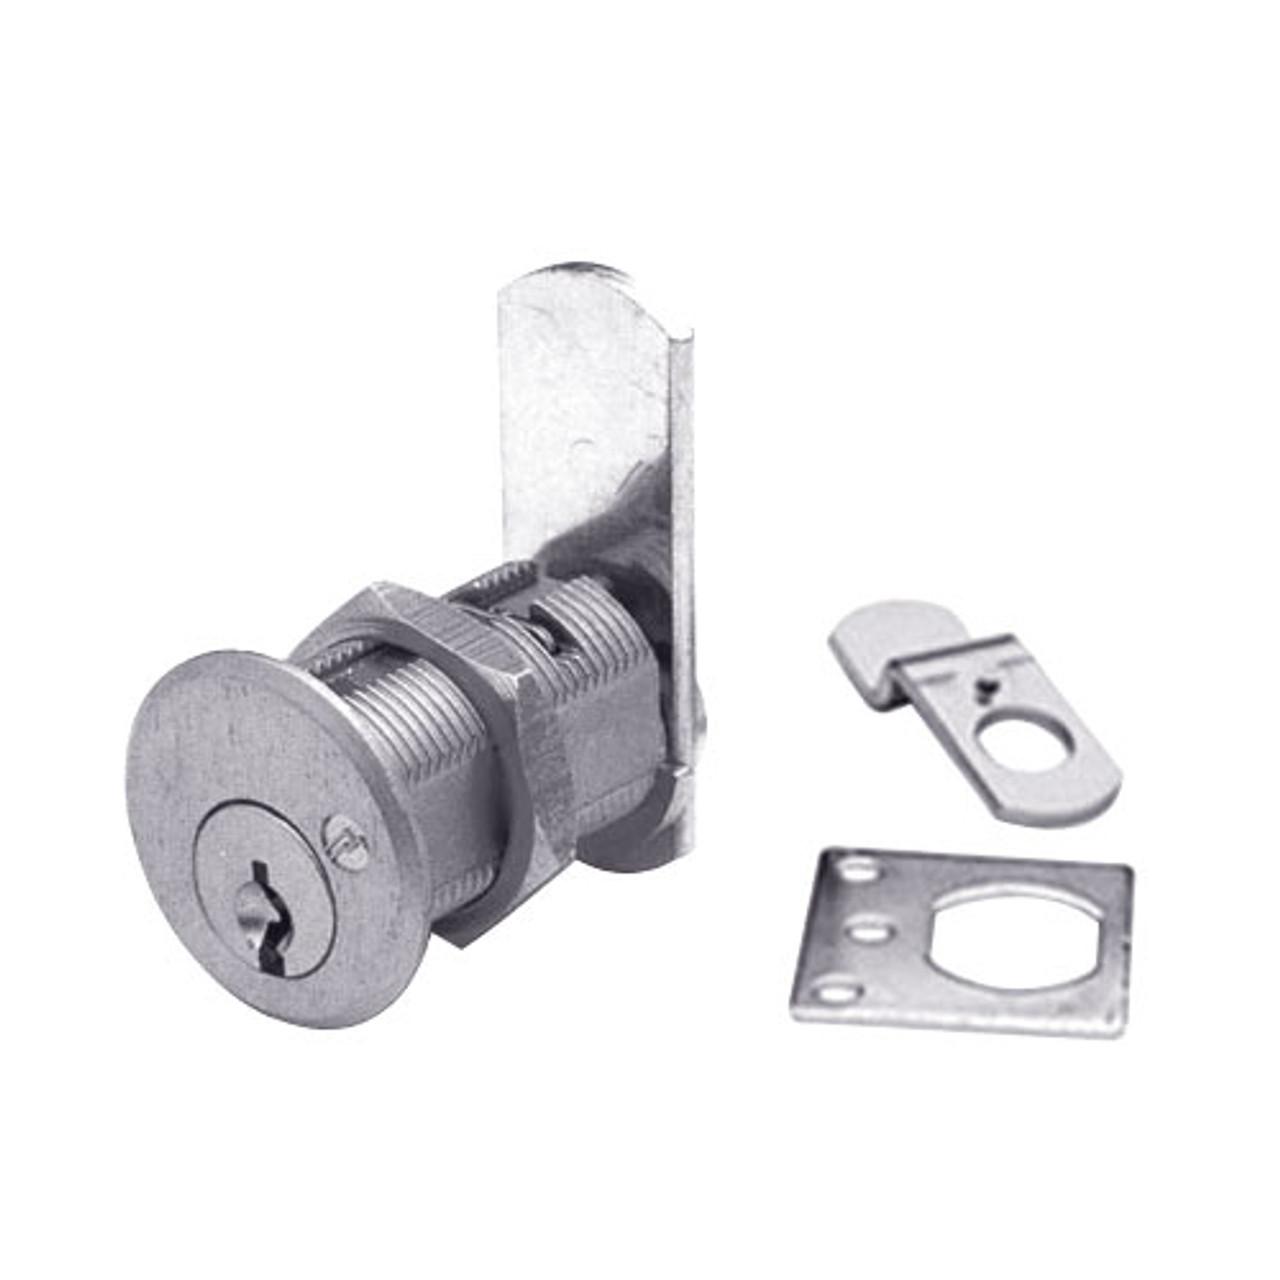 Olympus DCN4-KD-26D Cam Locks in Satin Chrome Finish